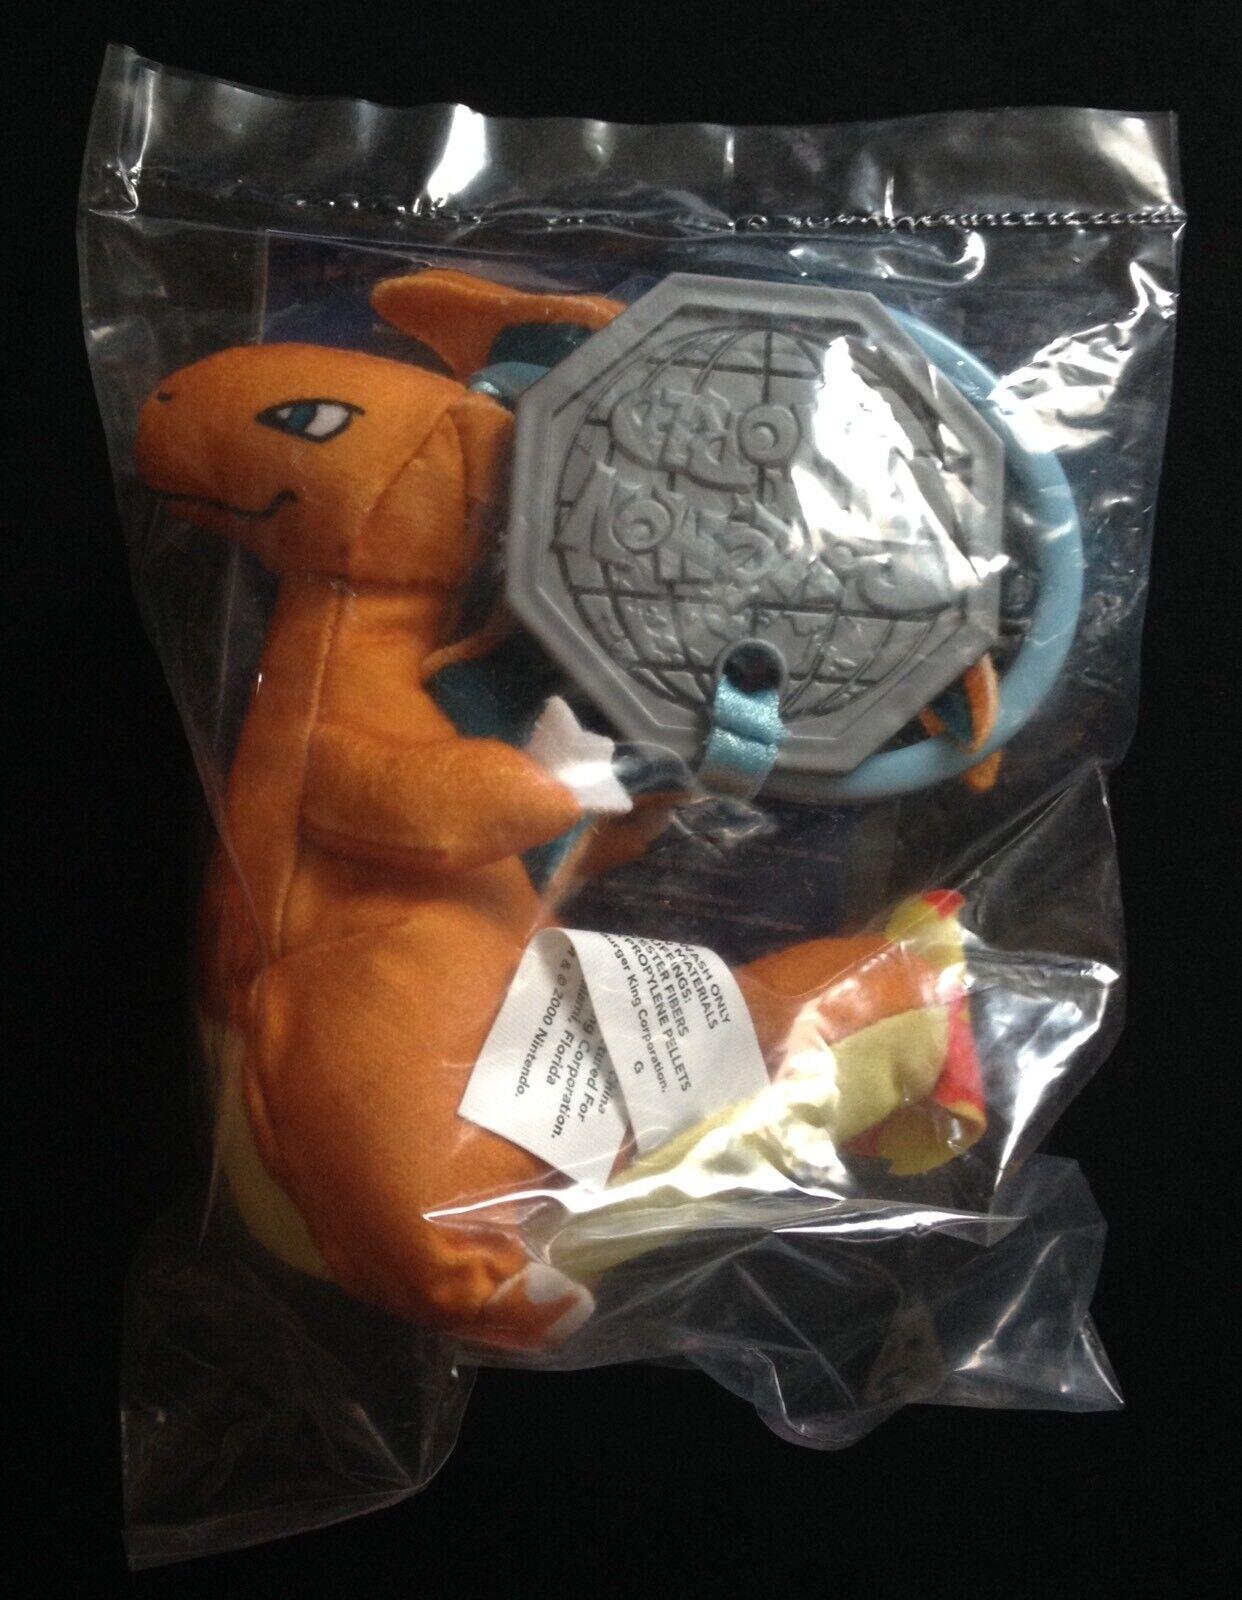 Charizard Burger King Plush Keyring Pokemon World 2000 SEALED -Save  Multi-buy